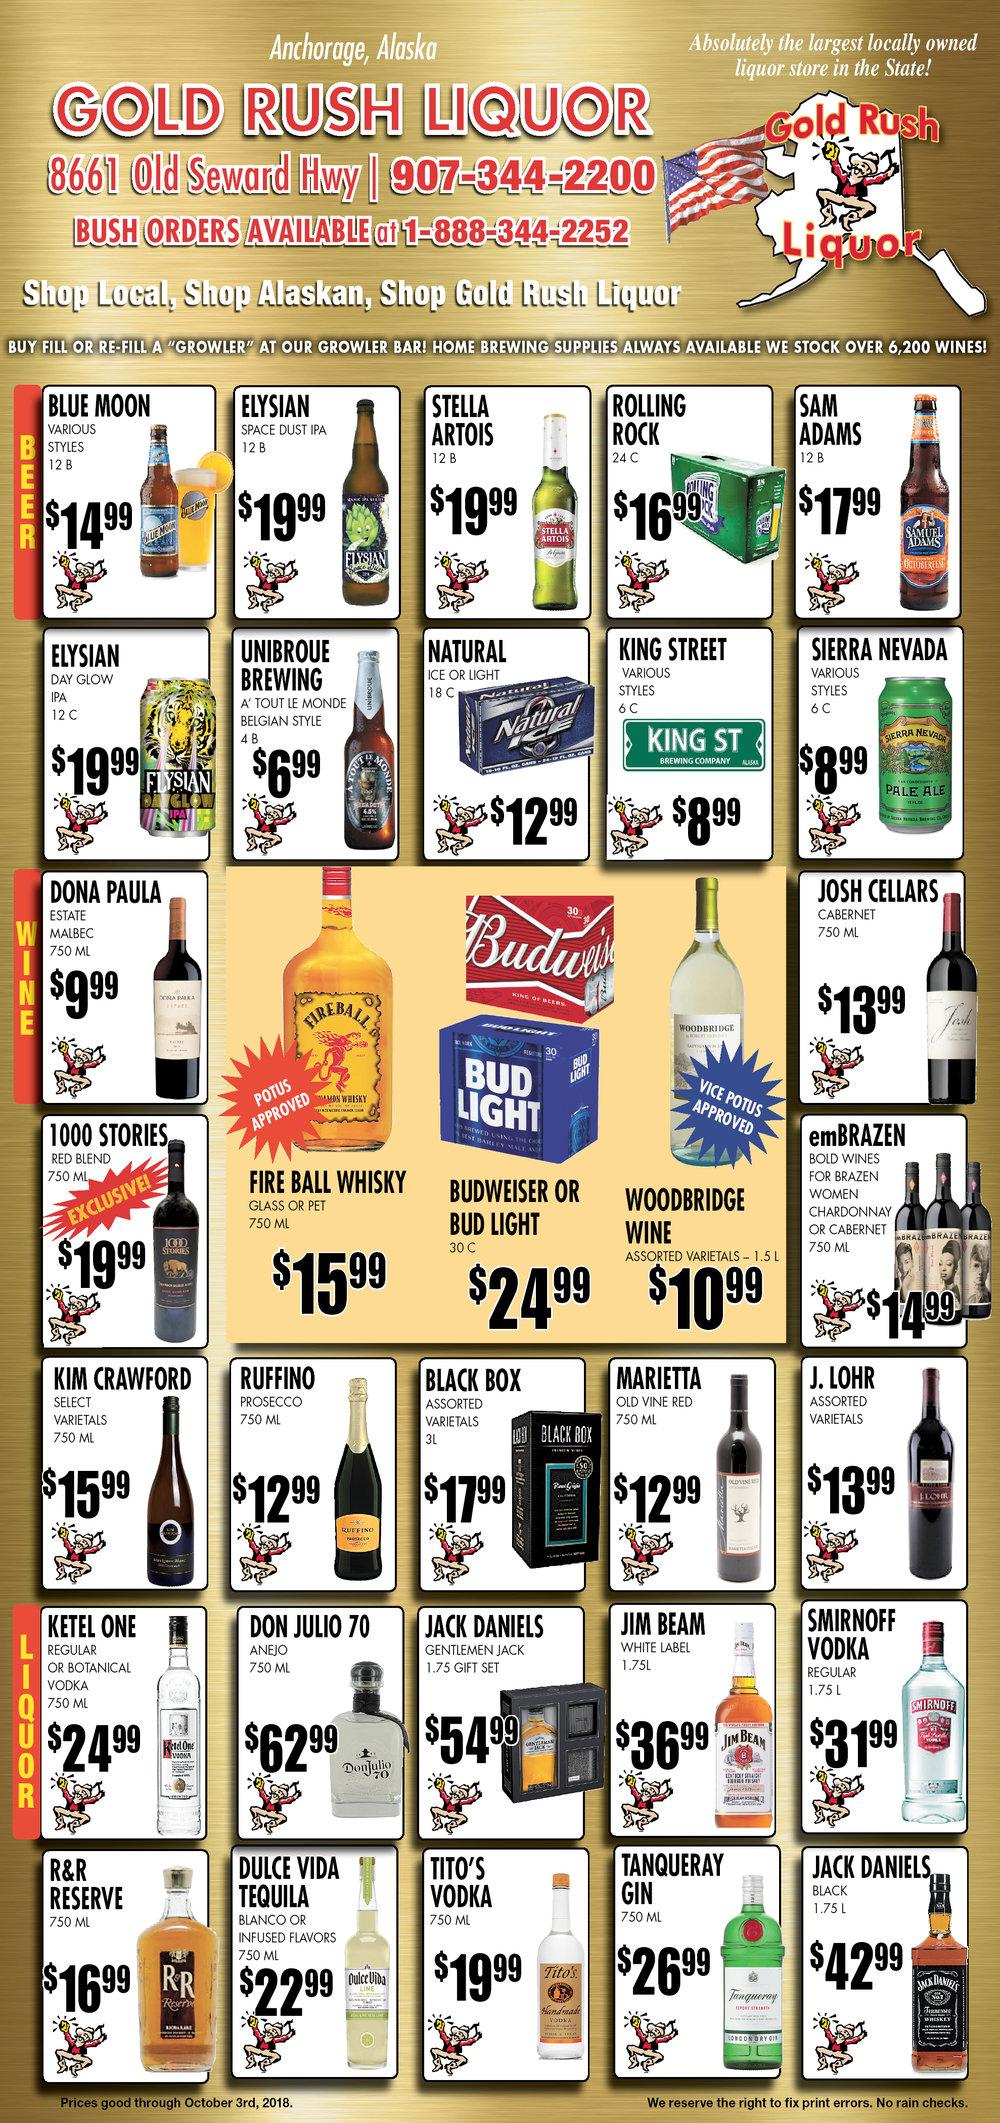 Gold Rush Liquor 09-13-2018 (2).jpg